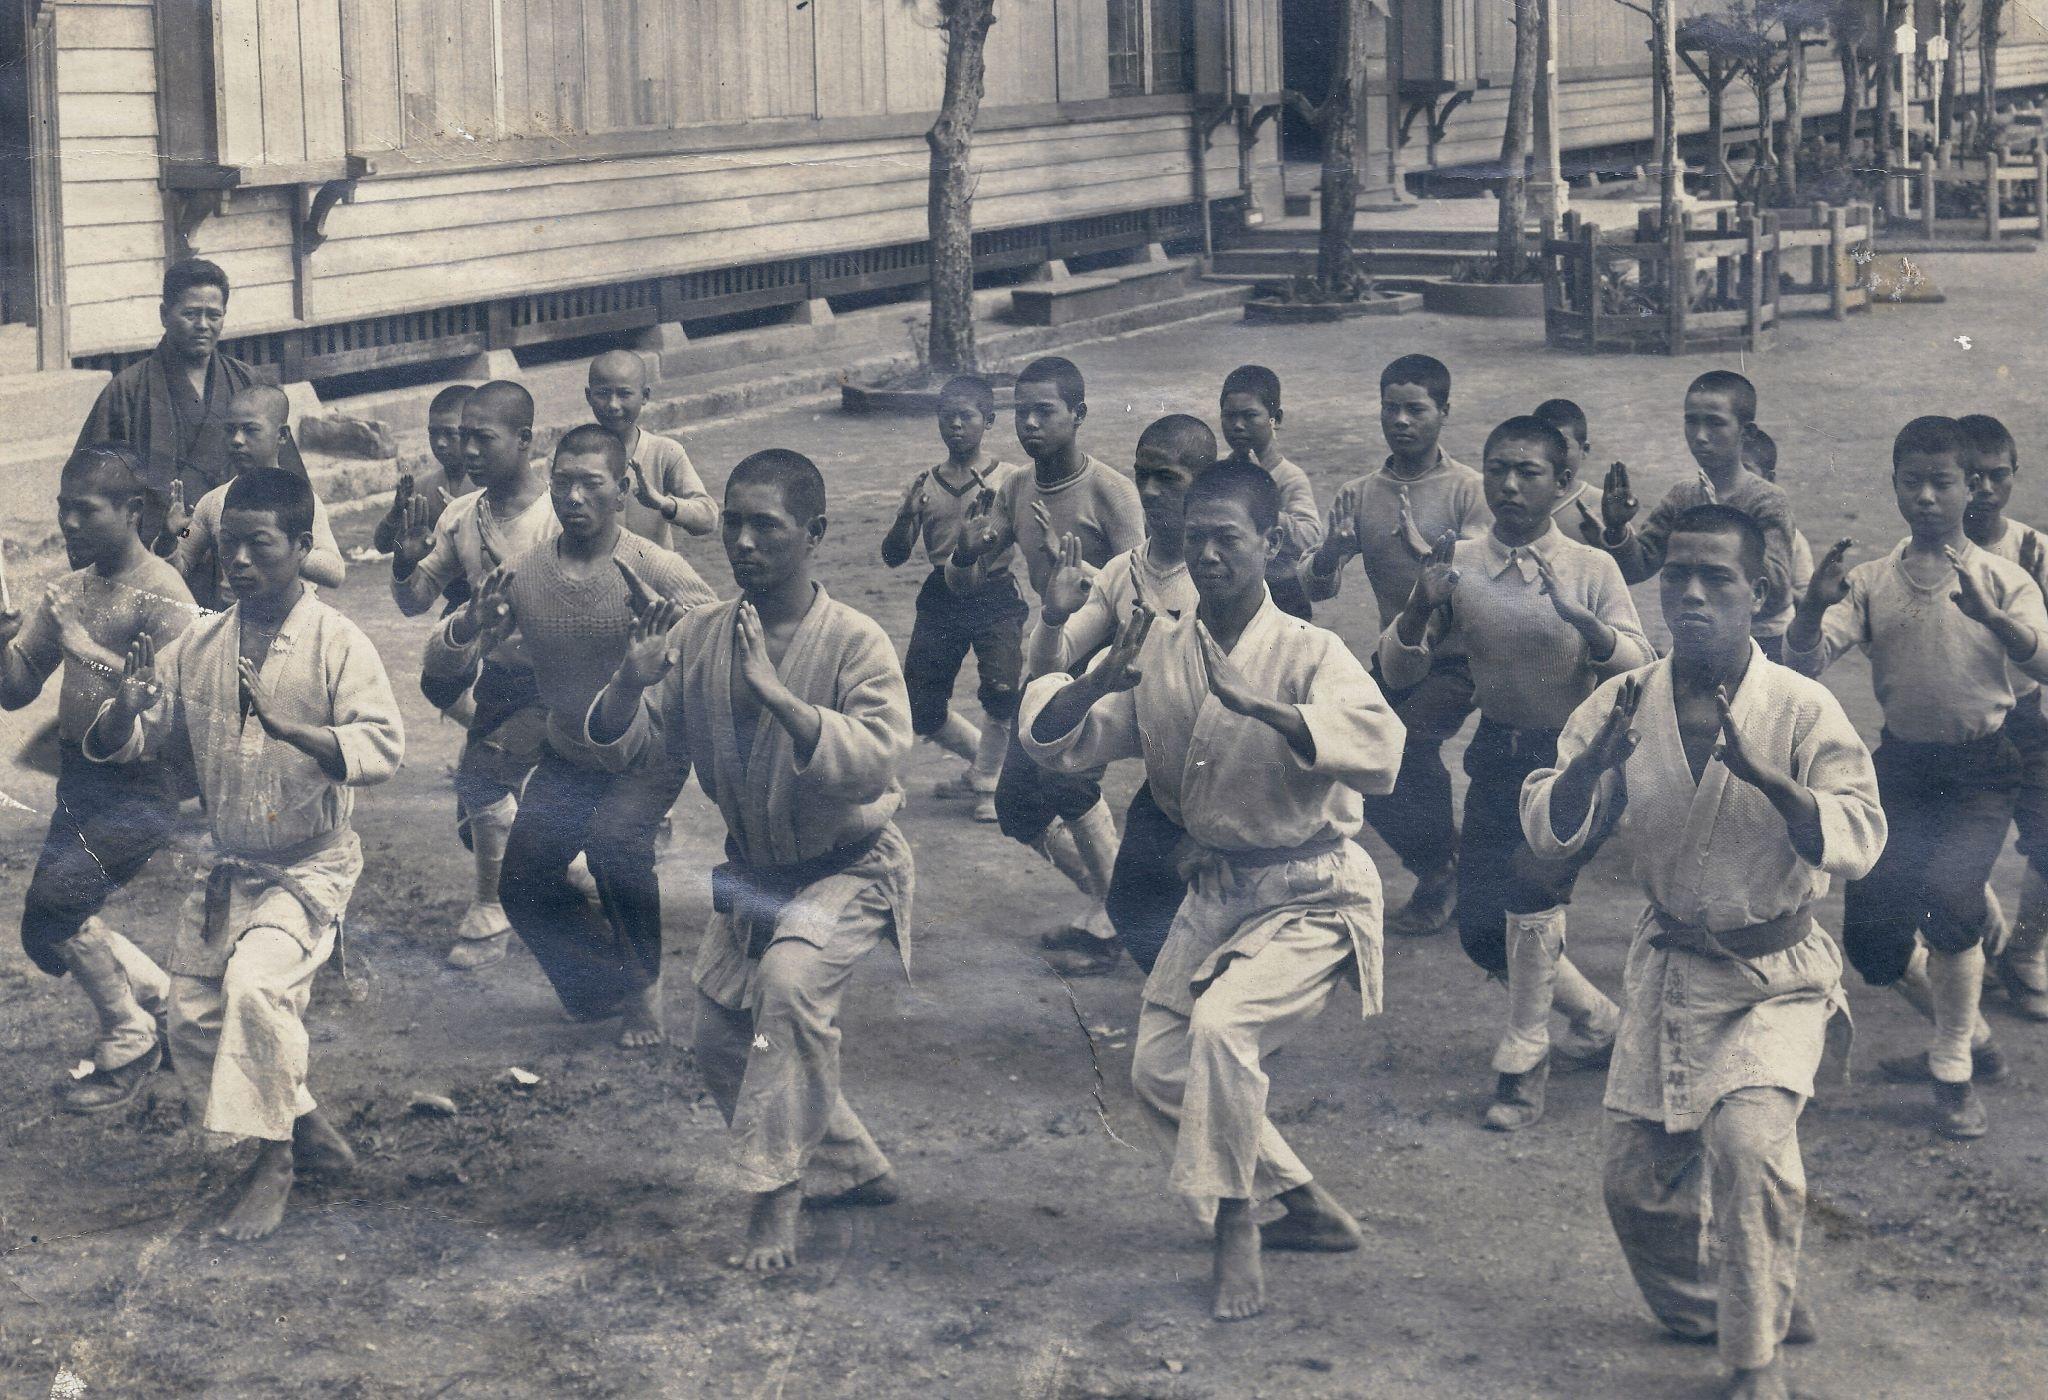 SENSEI MIYAGI CHOJUN TEACHING KARATE TO SCHOOL KIDS. C. 1930.